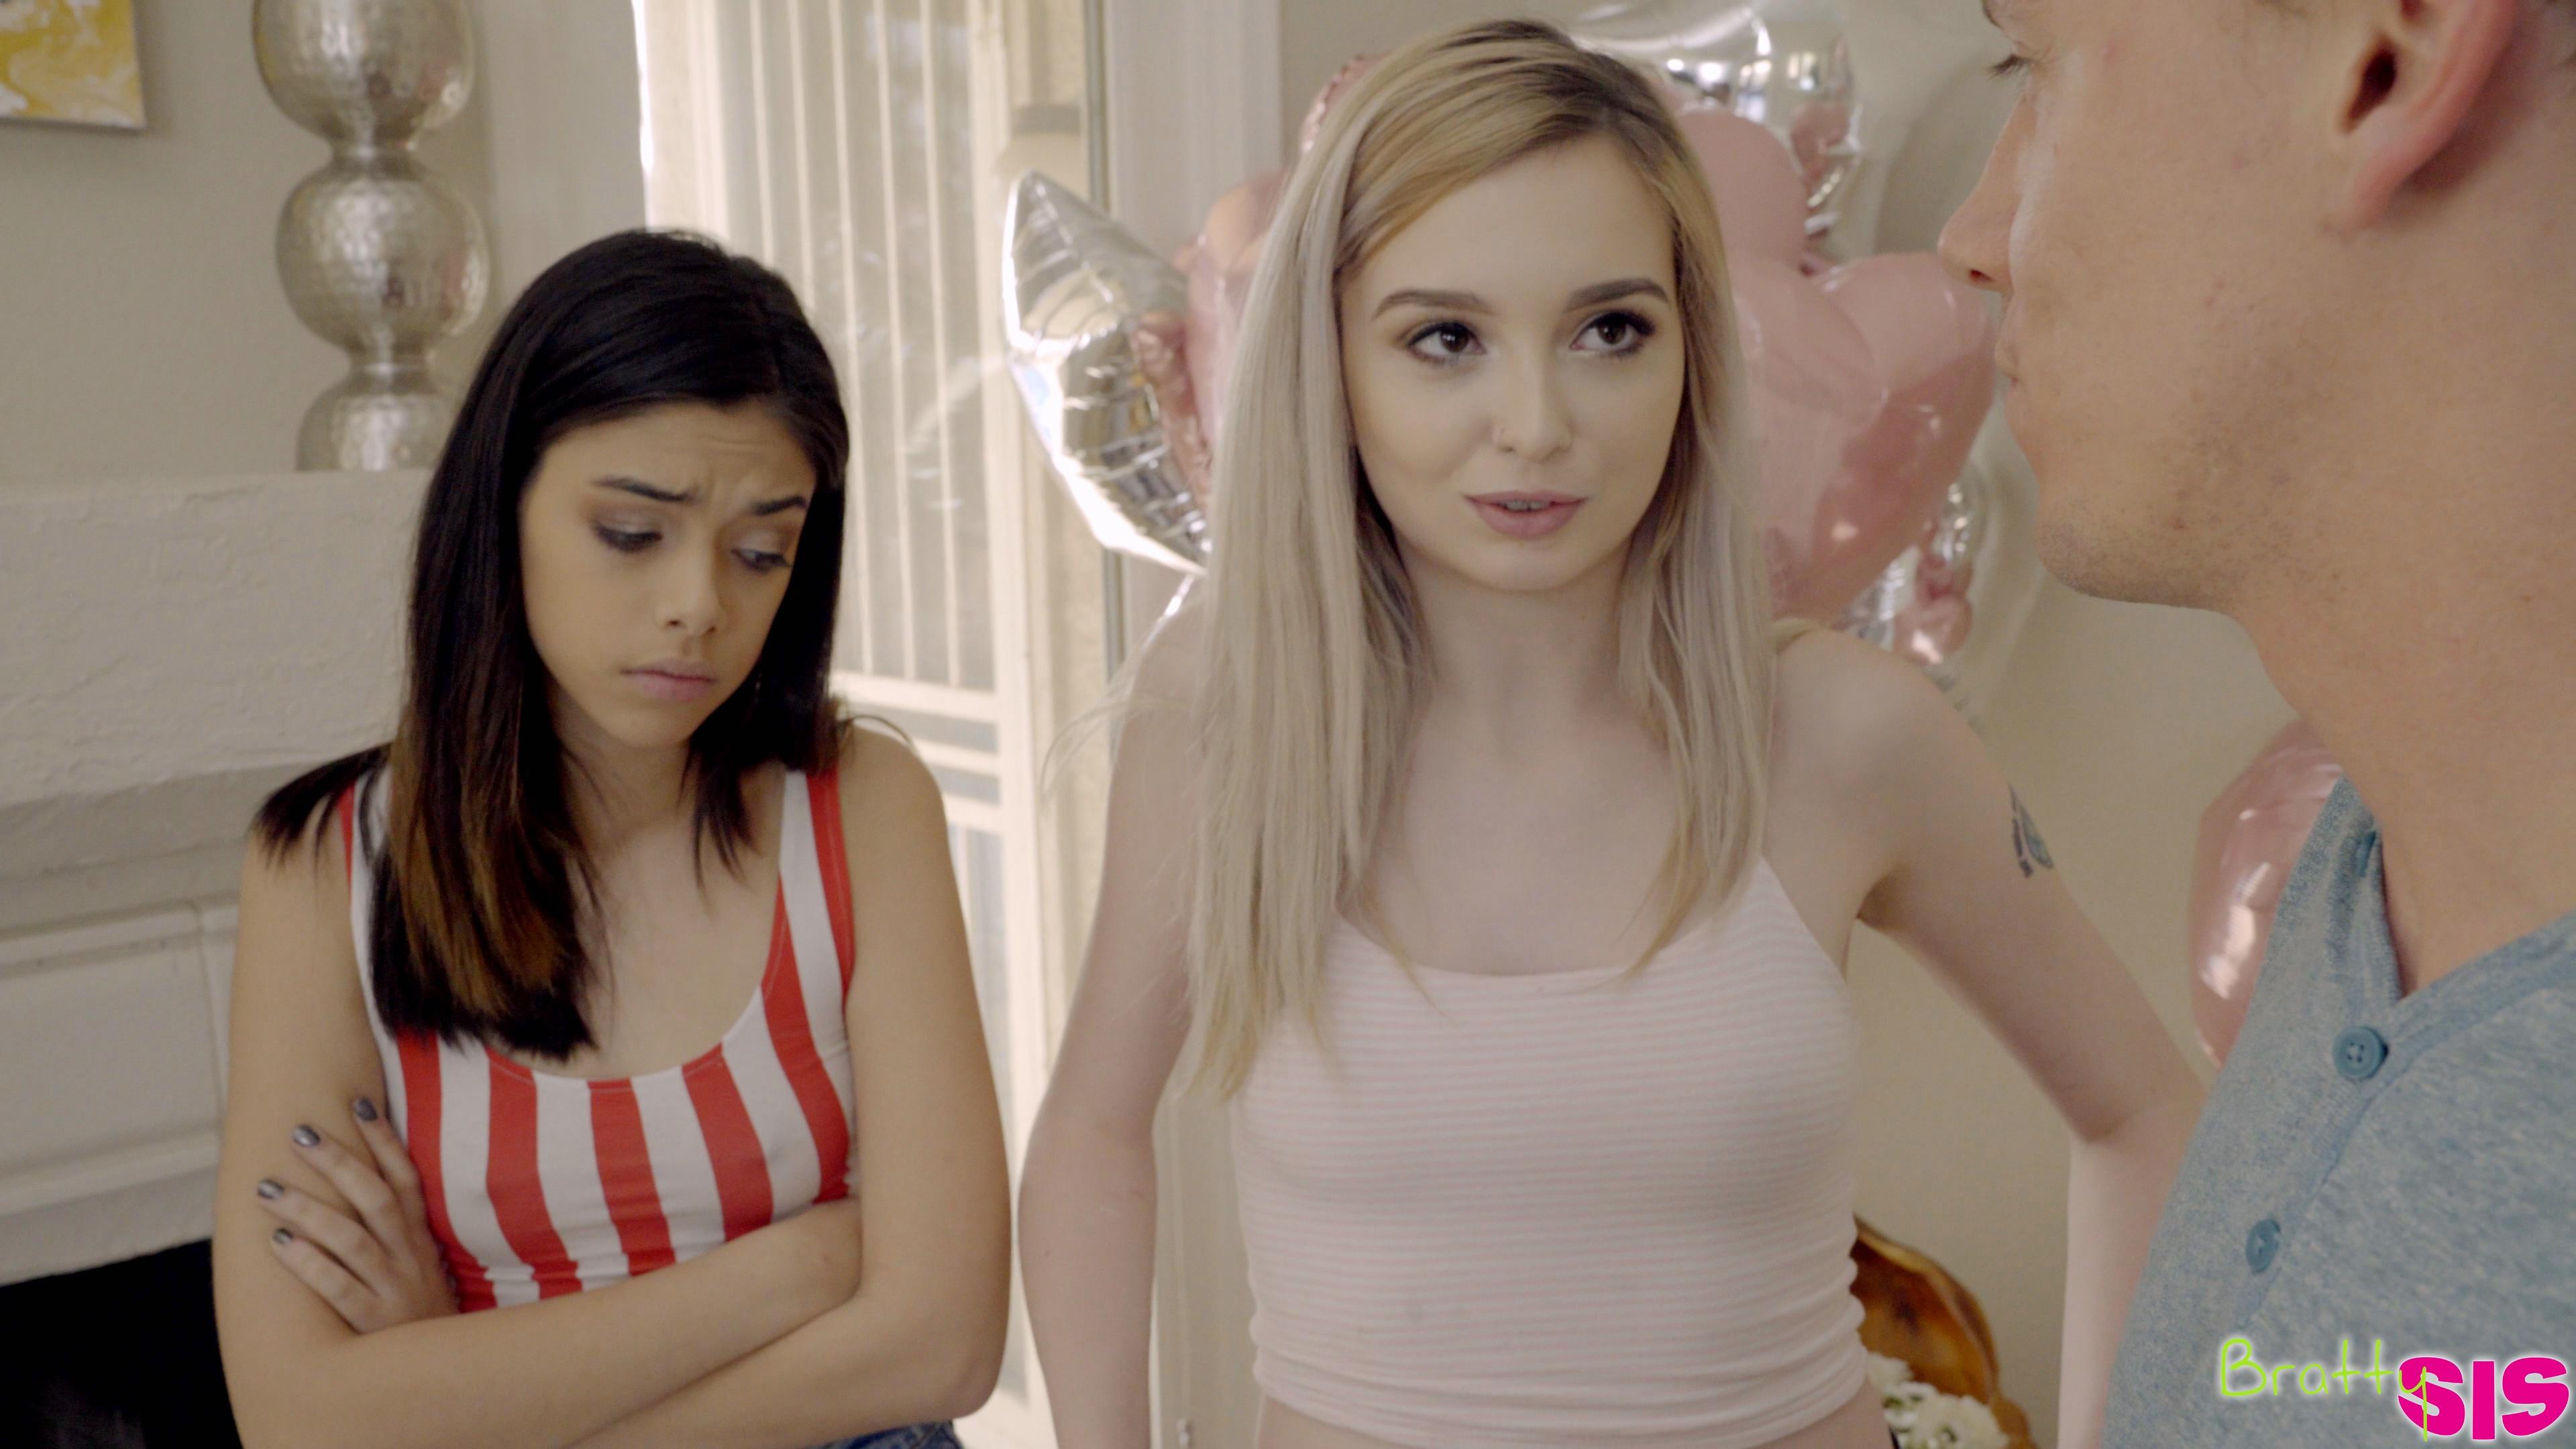 Lore Harmonie Wunder Lexi Adult film